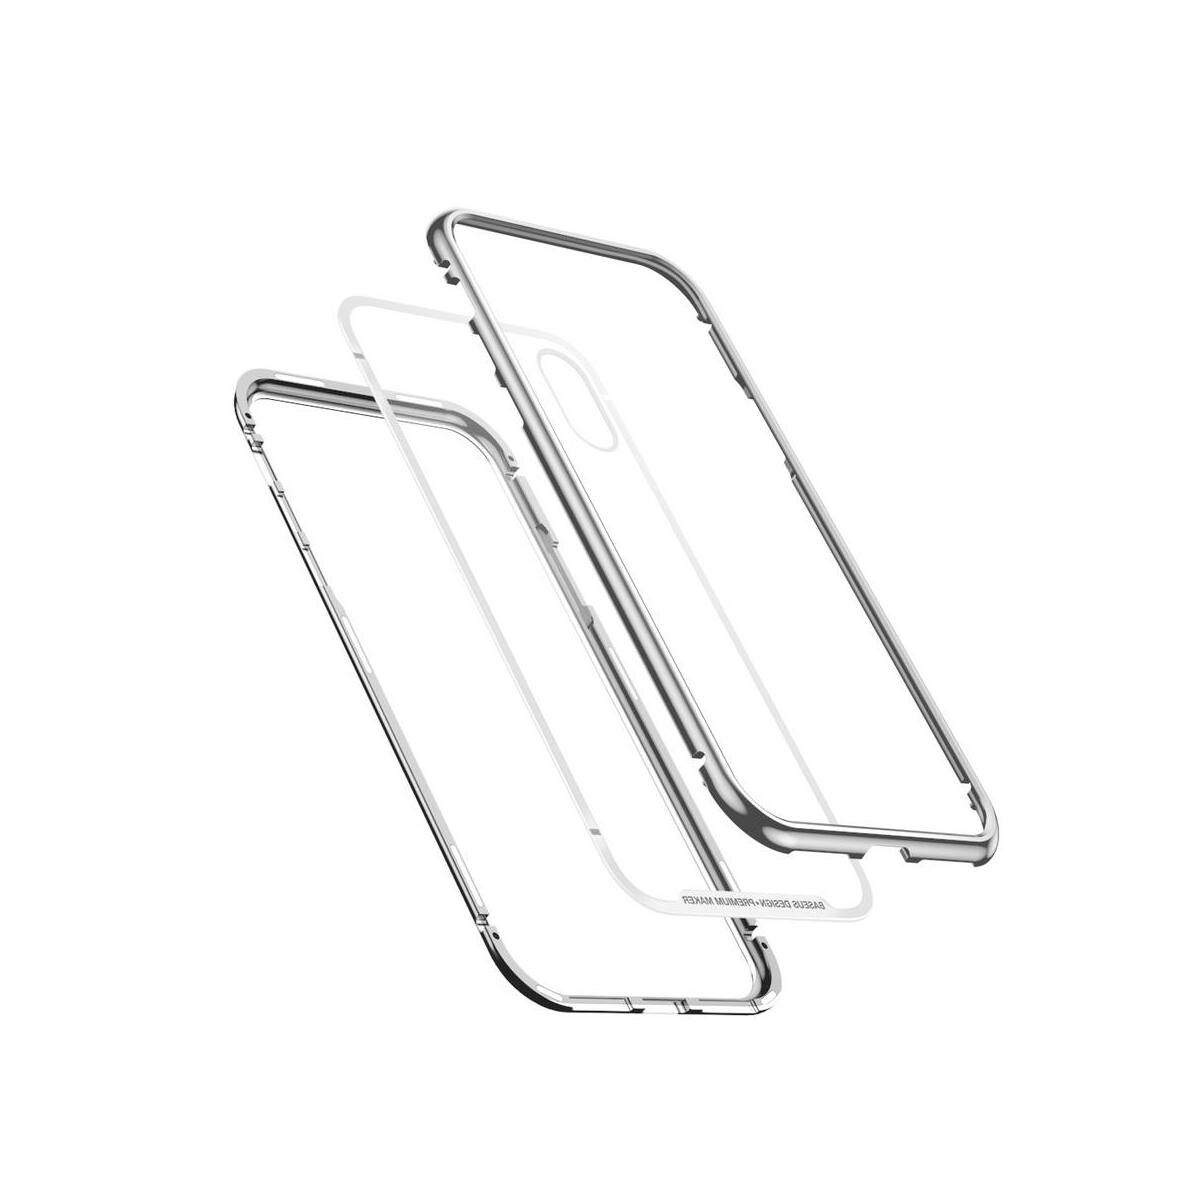 Baseus iPhone XS Max tok, Magnetite hardware, mágneses, ezüst (WIAPIPH65-CS0S)